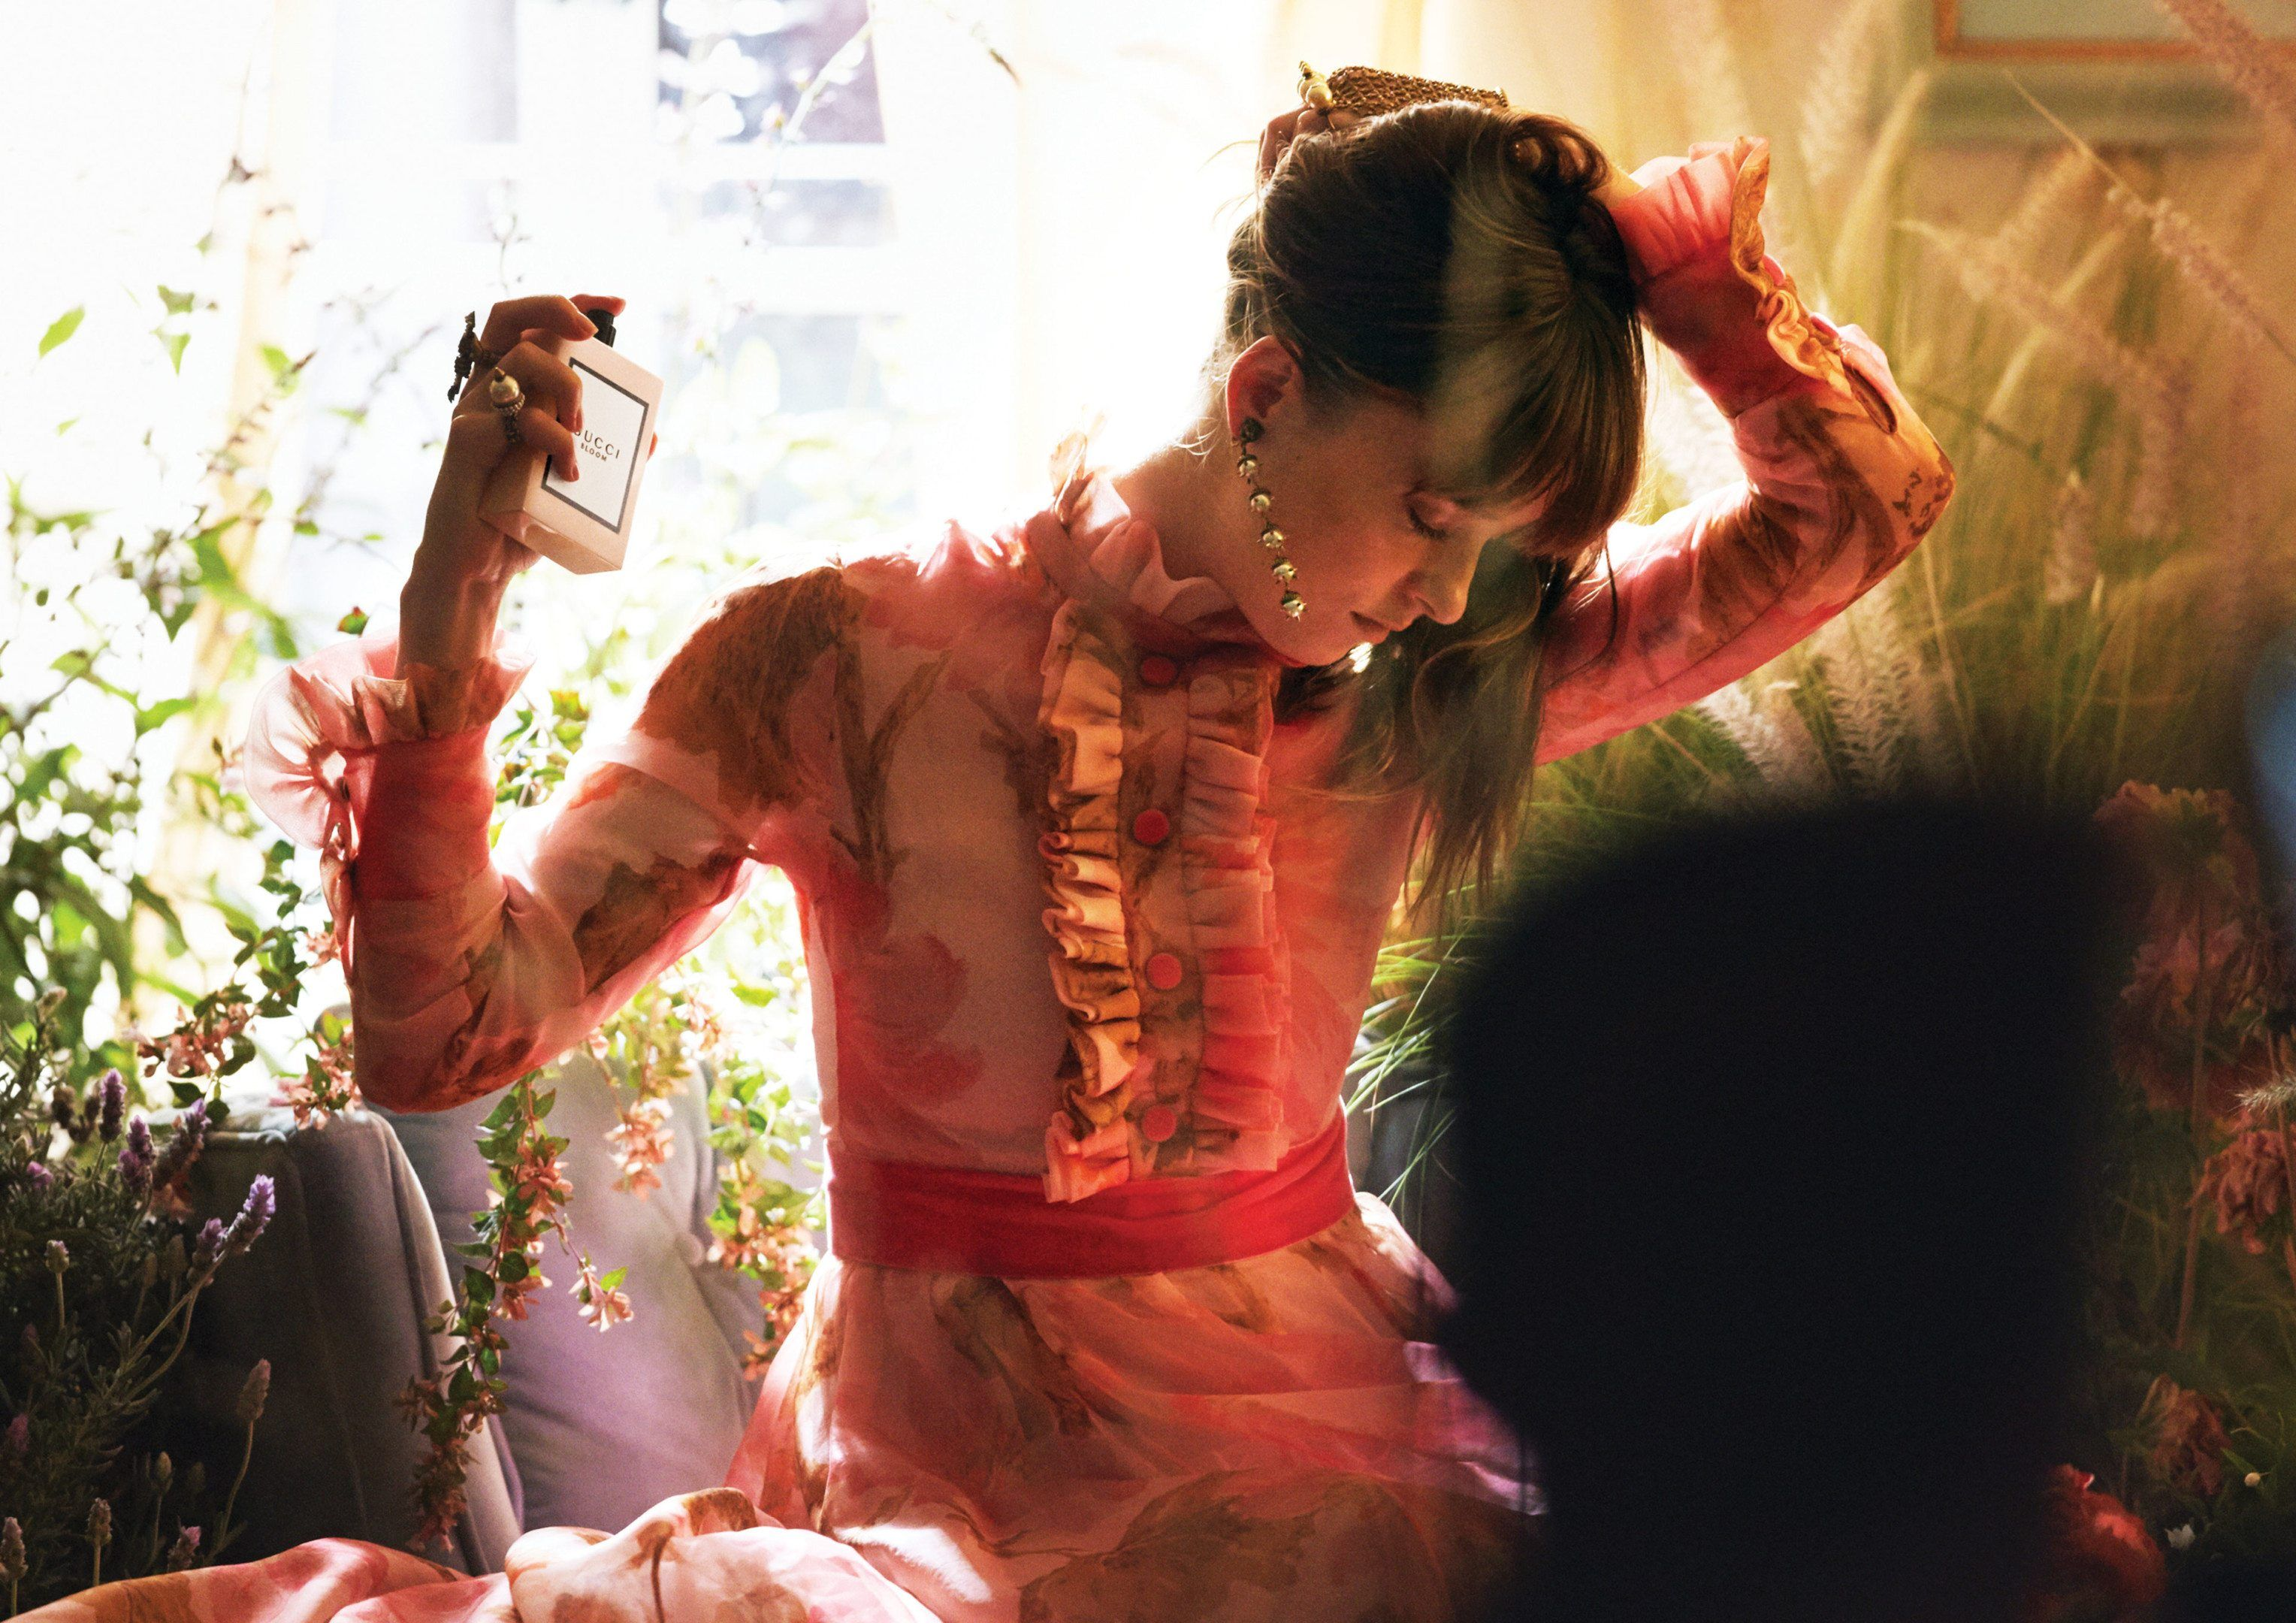 Dakota Johnson for Gucci Bloom